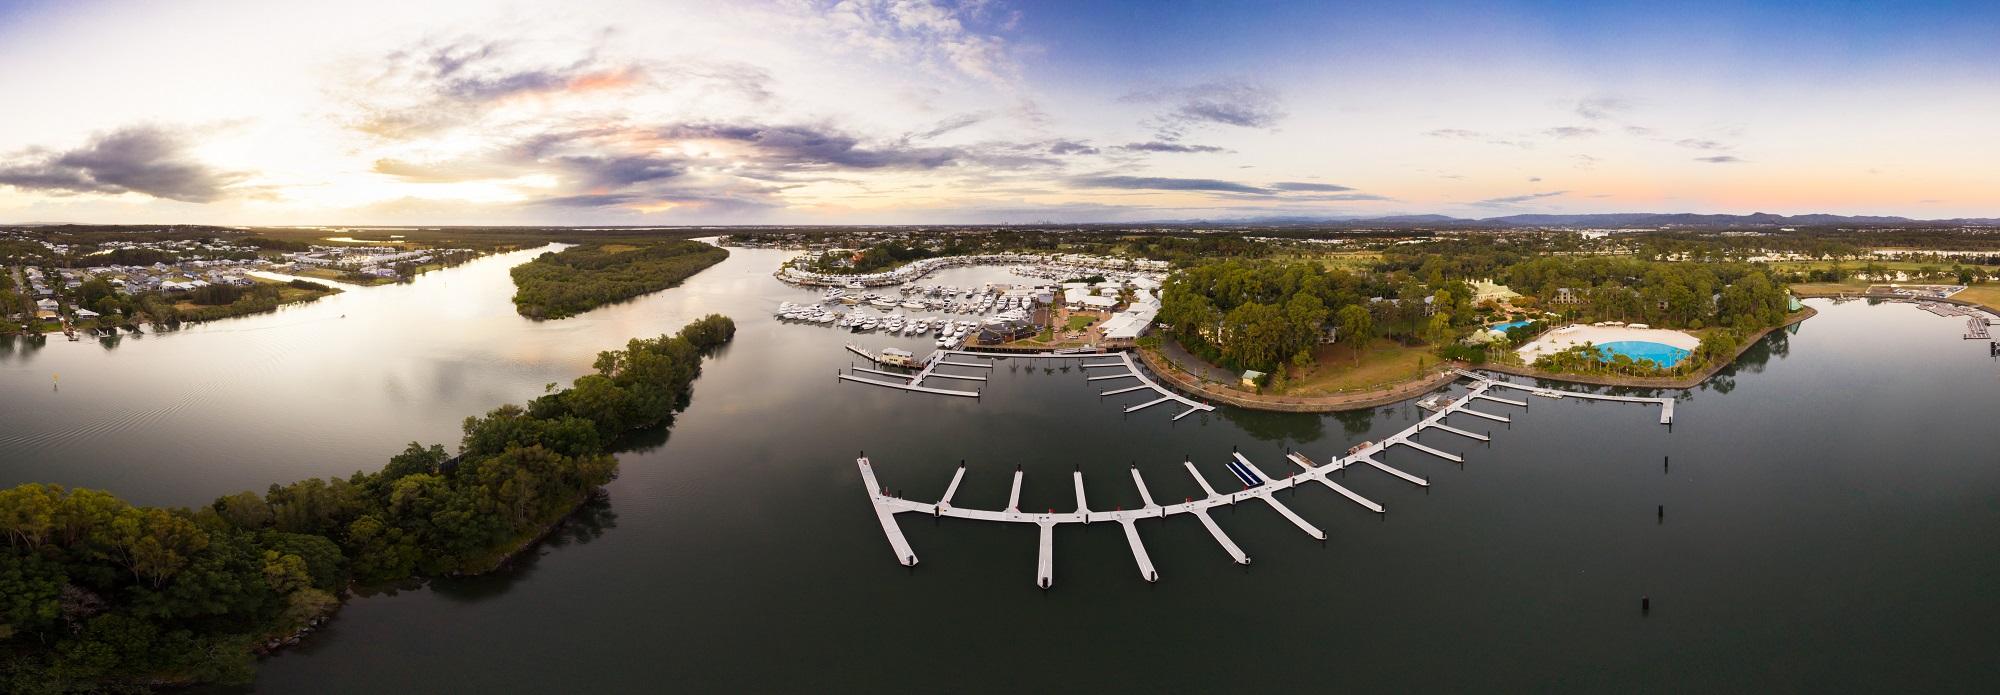 Sanctuary Cove Marina Expansion